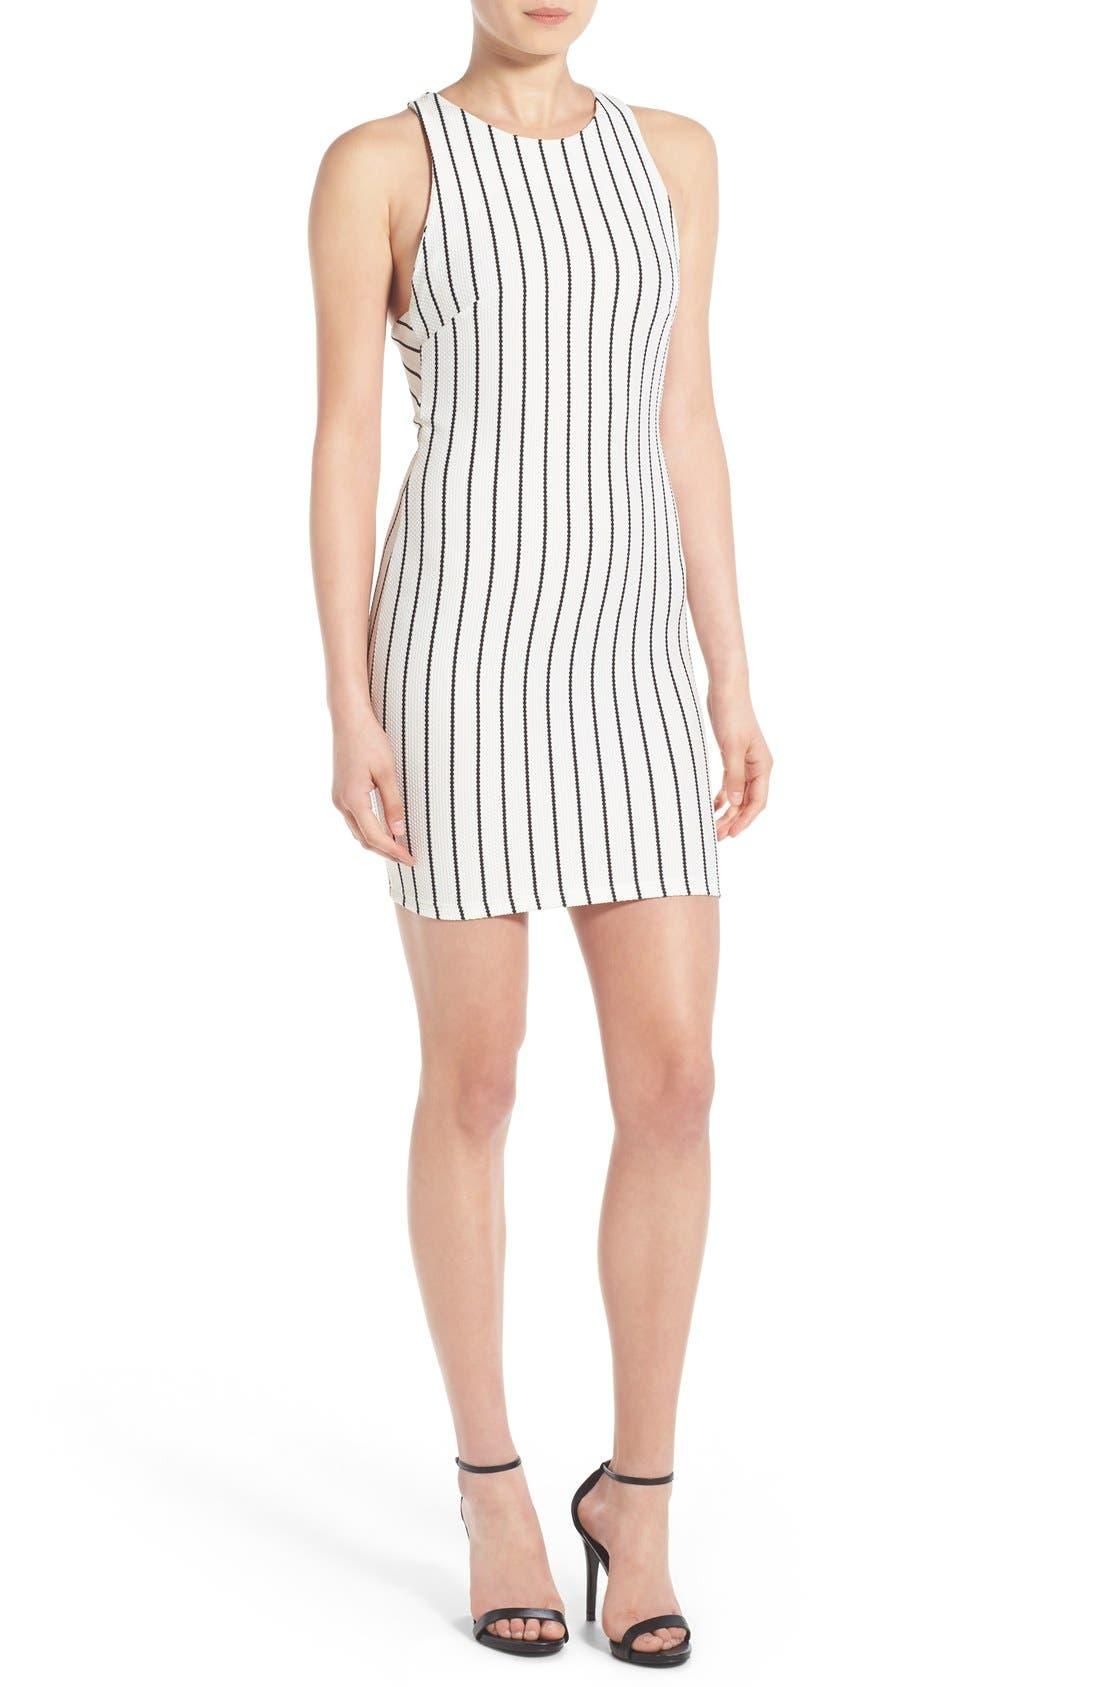 Alternate Image 1 Selected - Lush Clothing Stripe Body-Con Dress